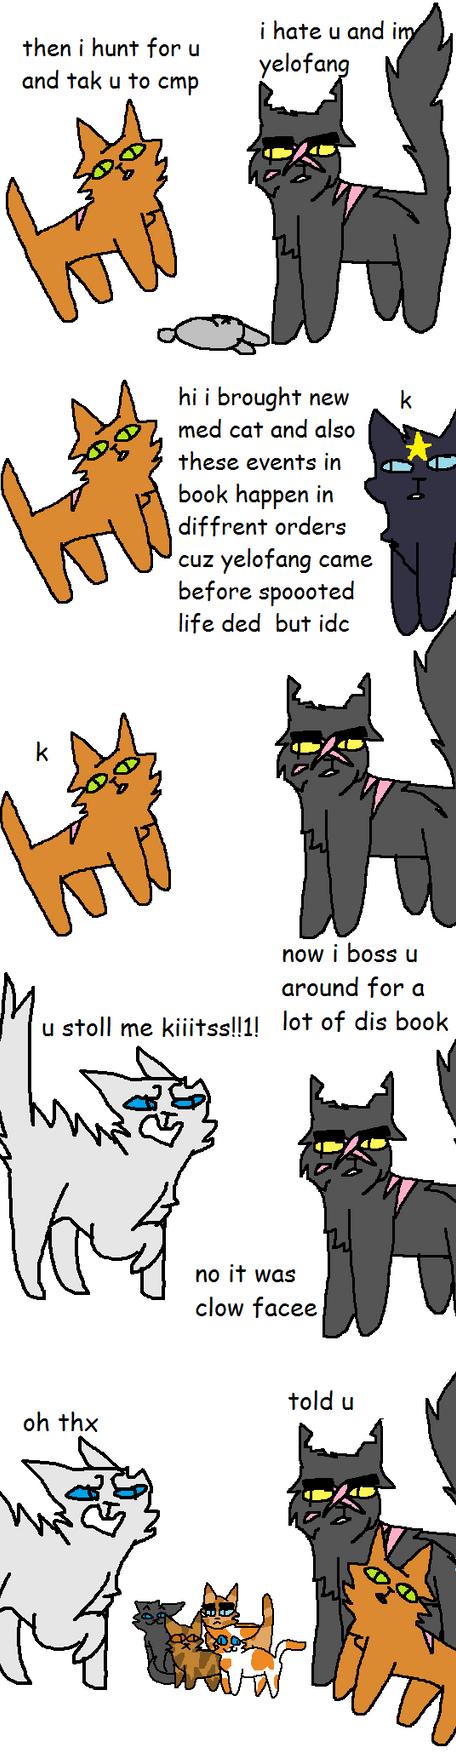 Warrior Cats In A Nutshell 5 by XxBirchTreexX